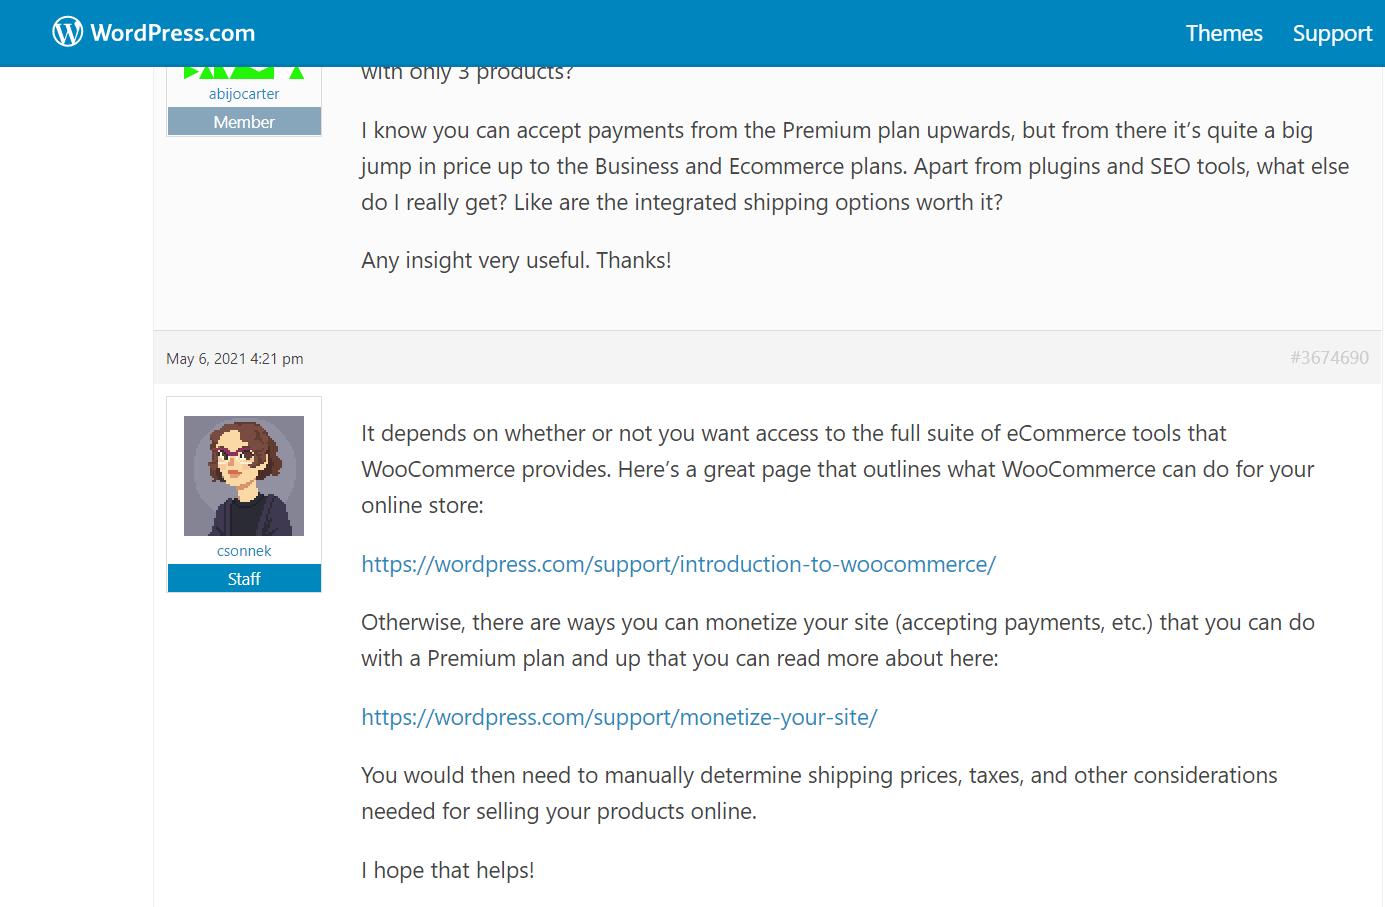 WordPress forum support